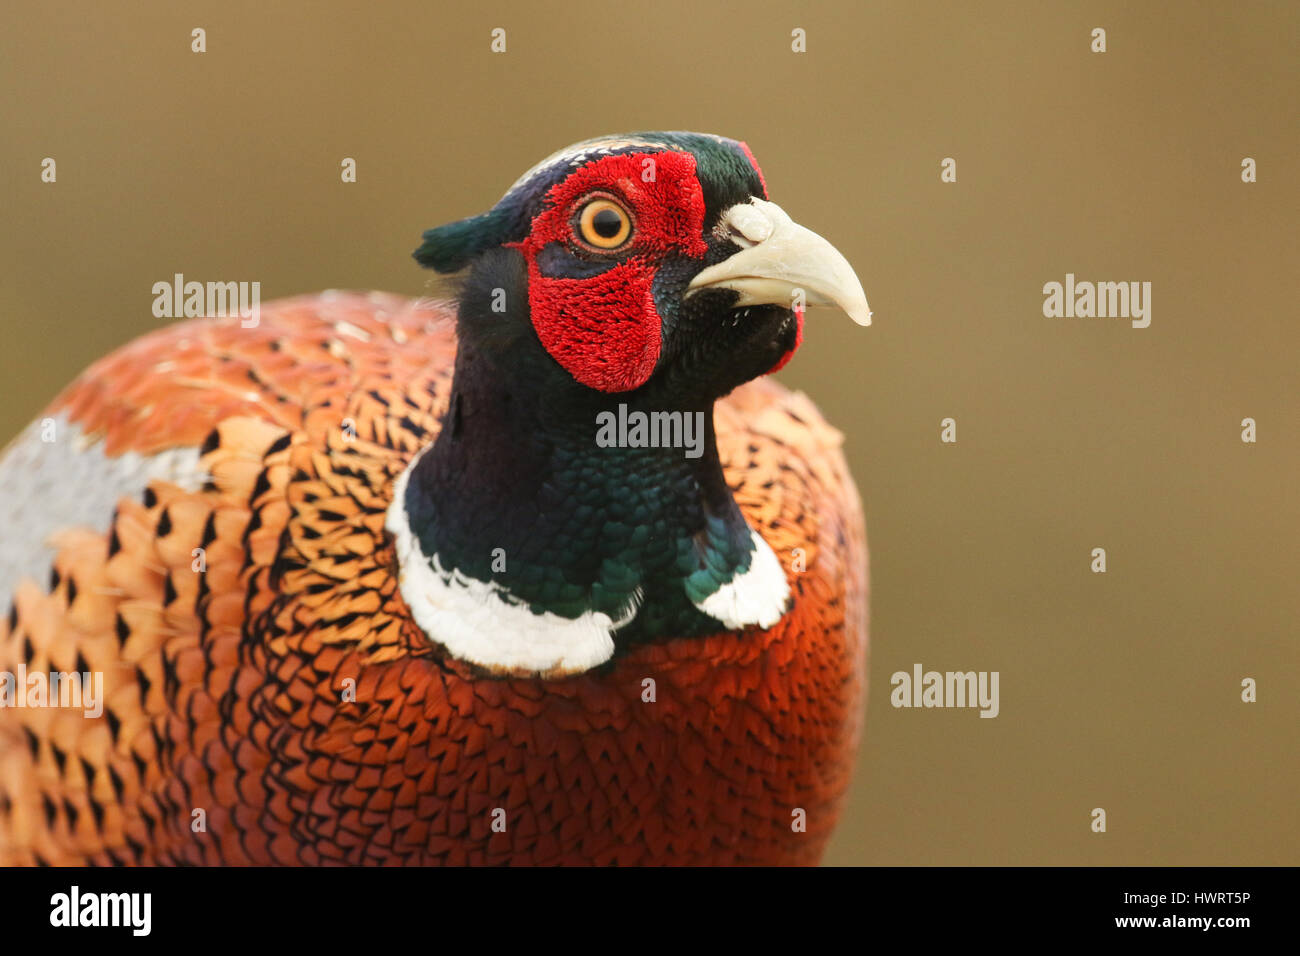 A head shot of a beautiful male Pheasant (Phasianus colchicus). - Stock Image